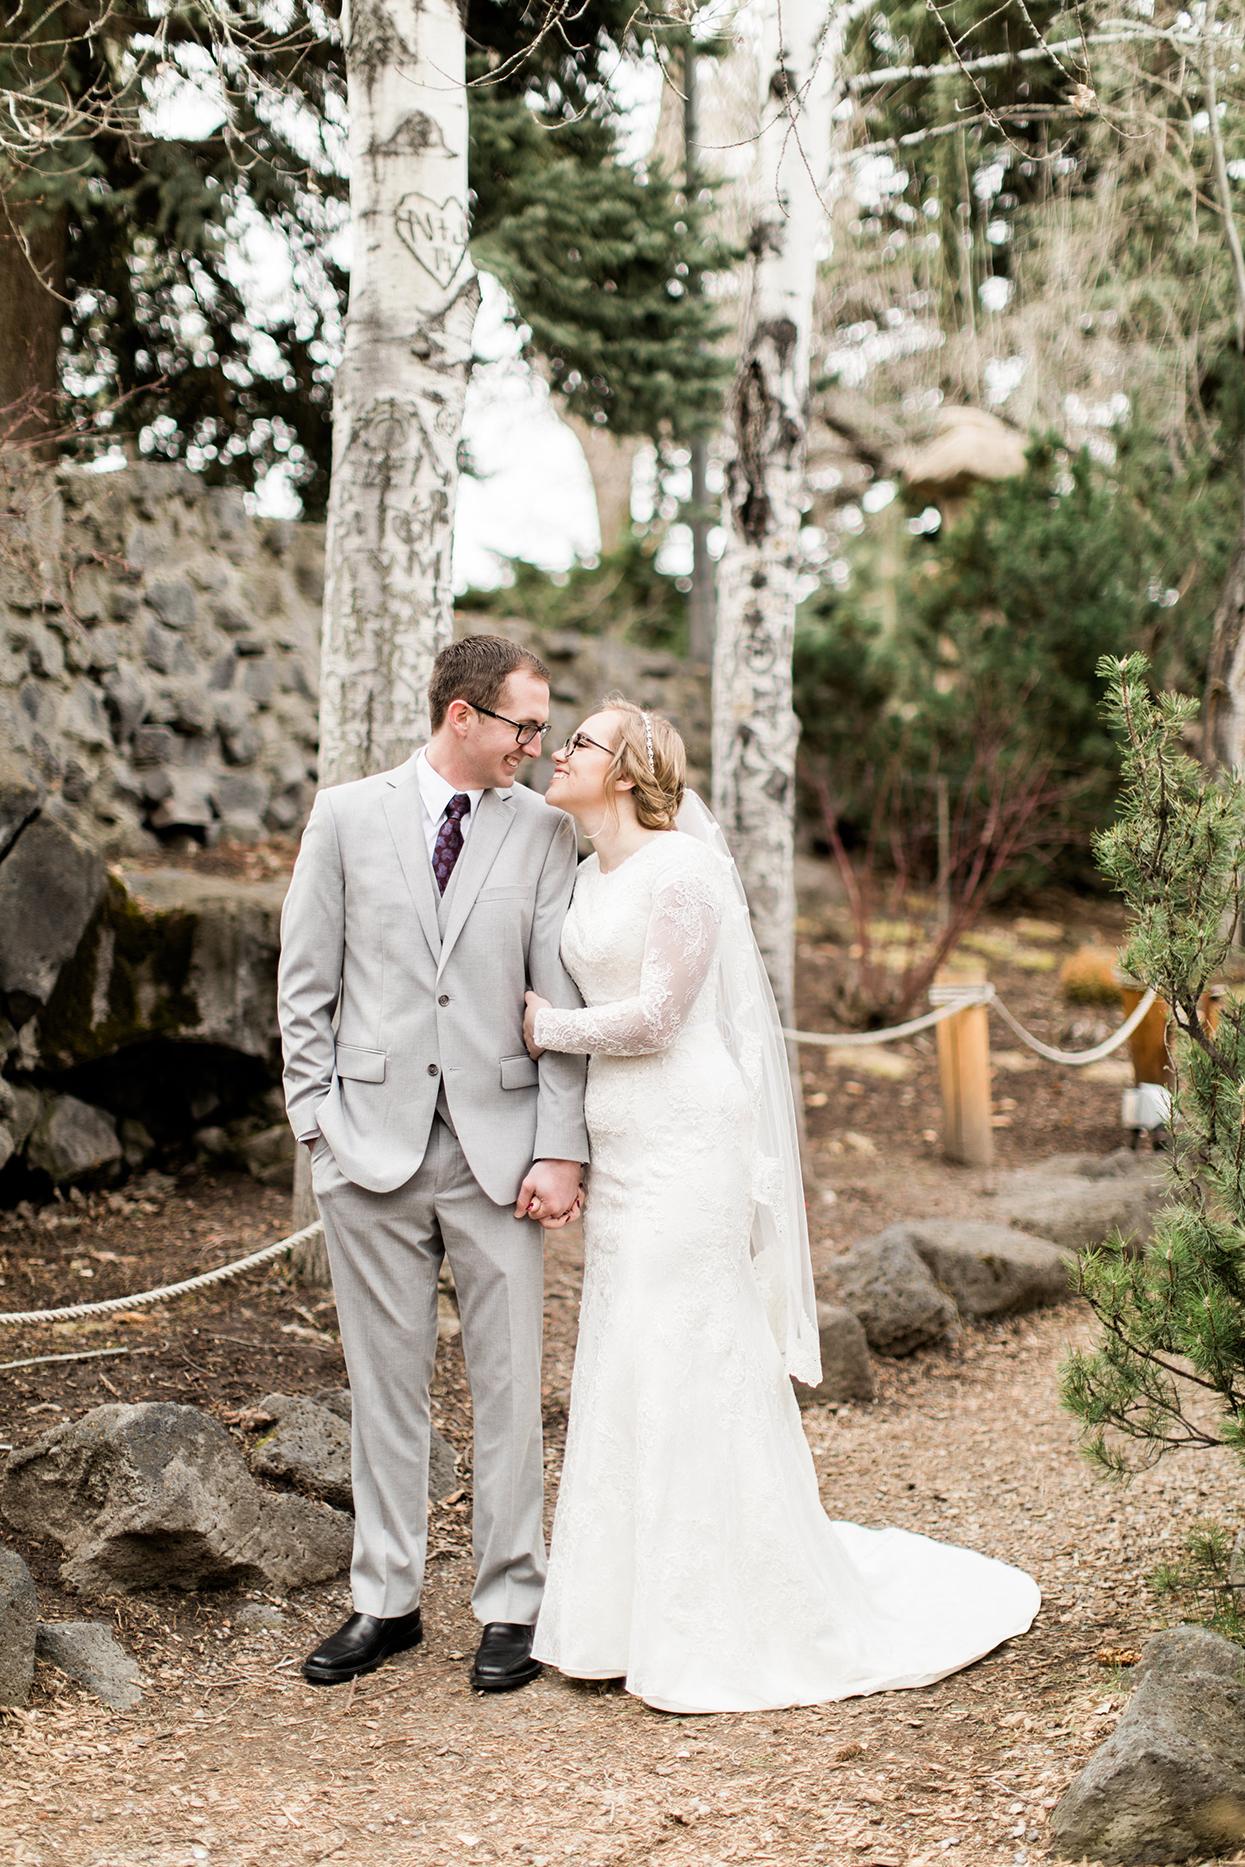 Callister Wedding April 14 2018-print-0066.jpg